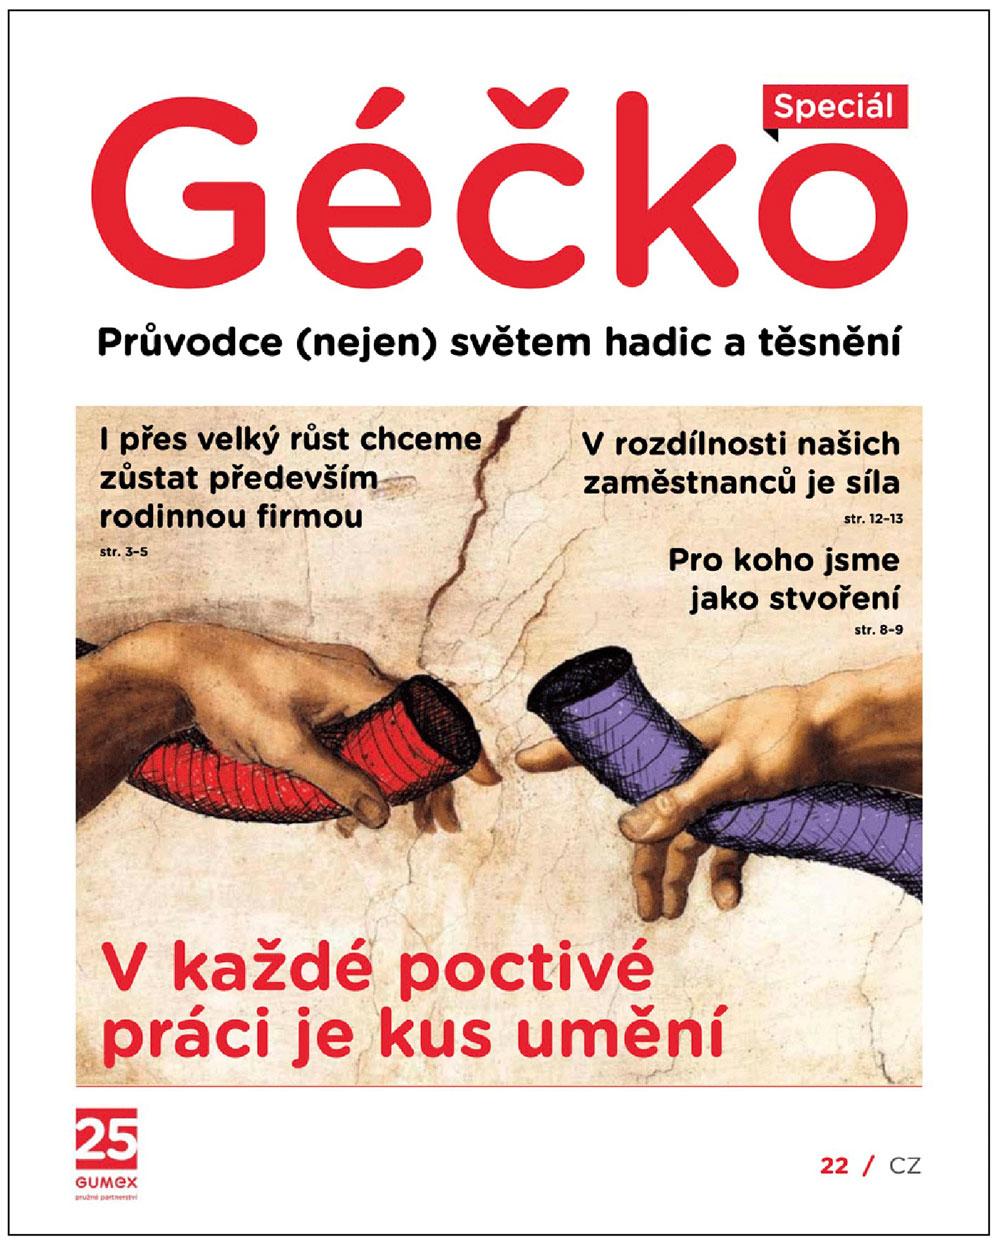 Géčko-speciál1